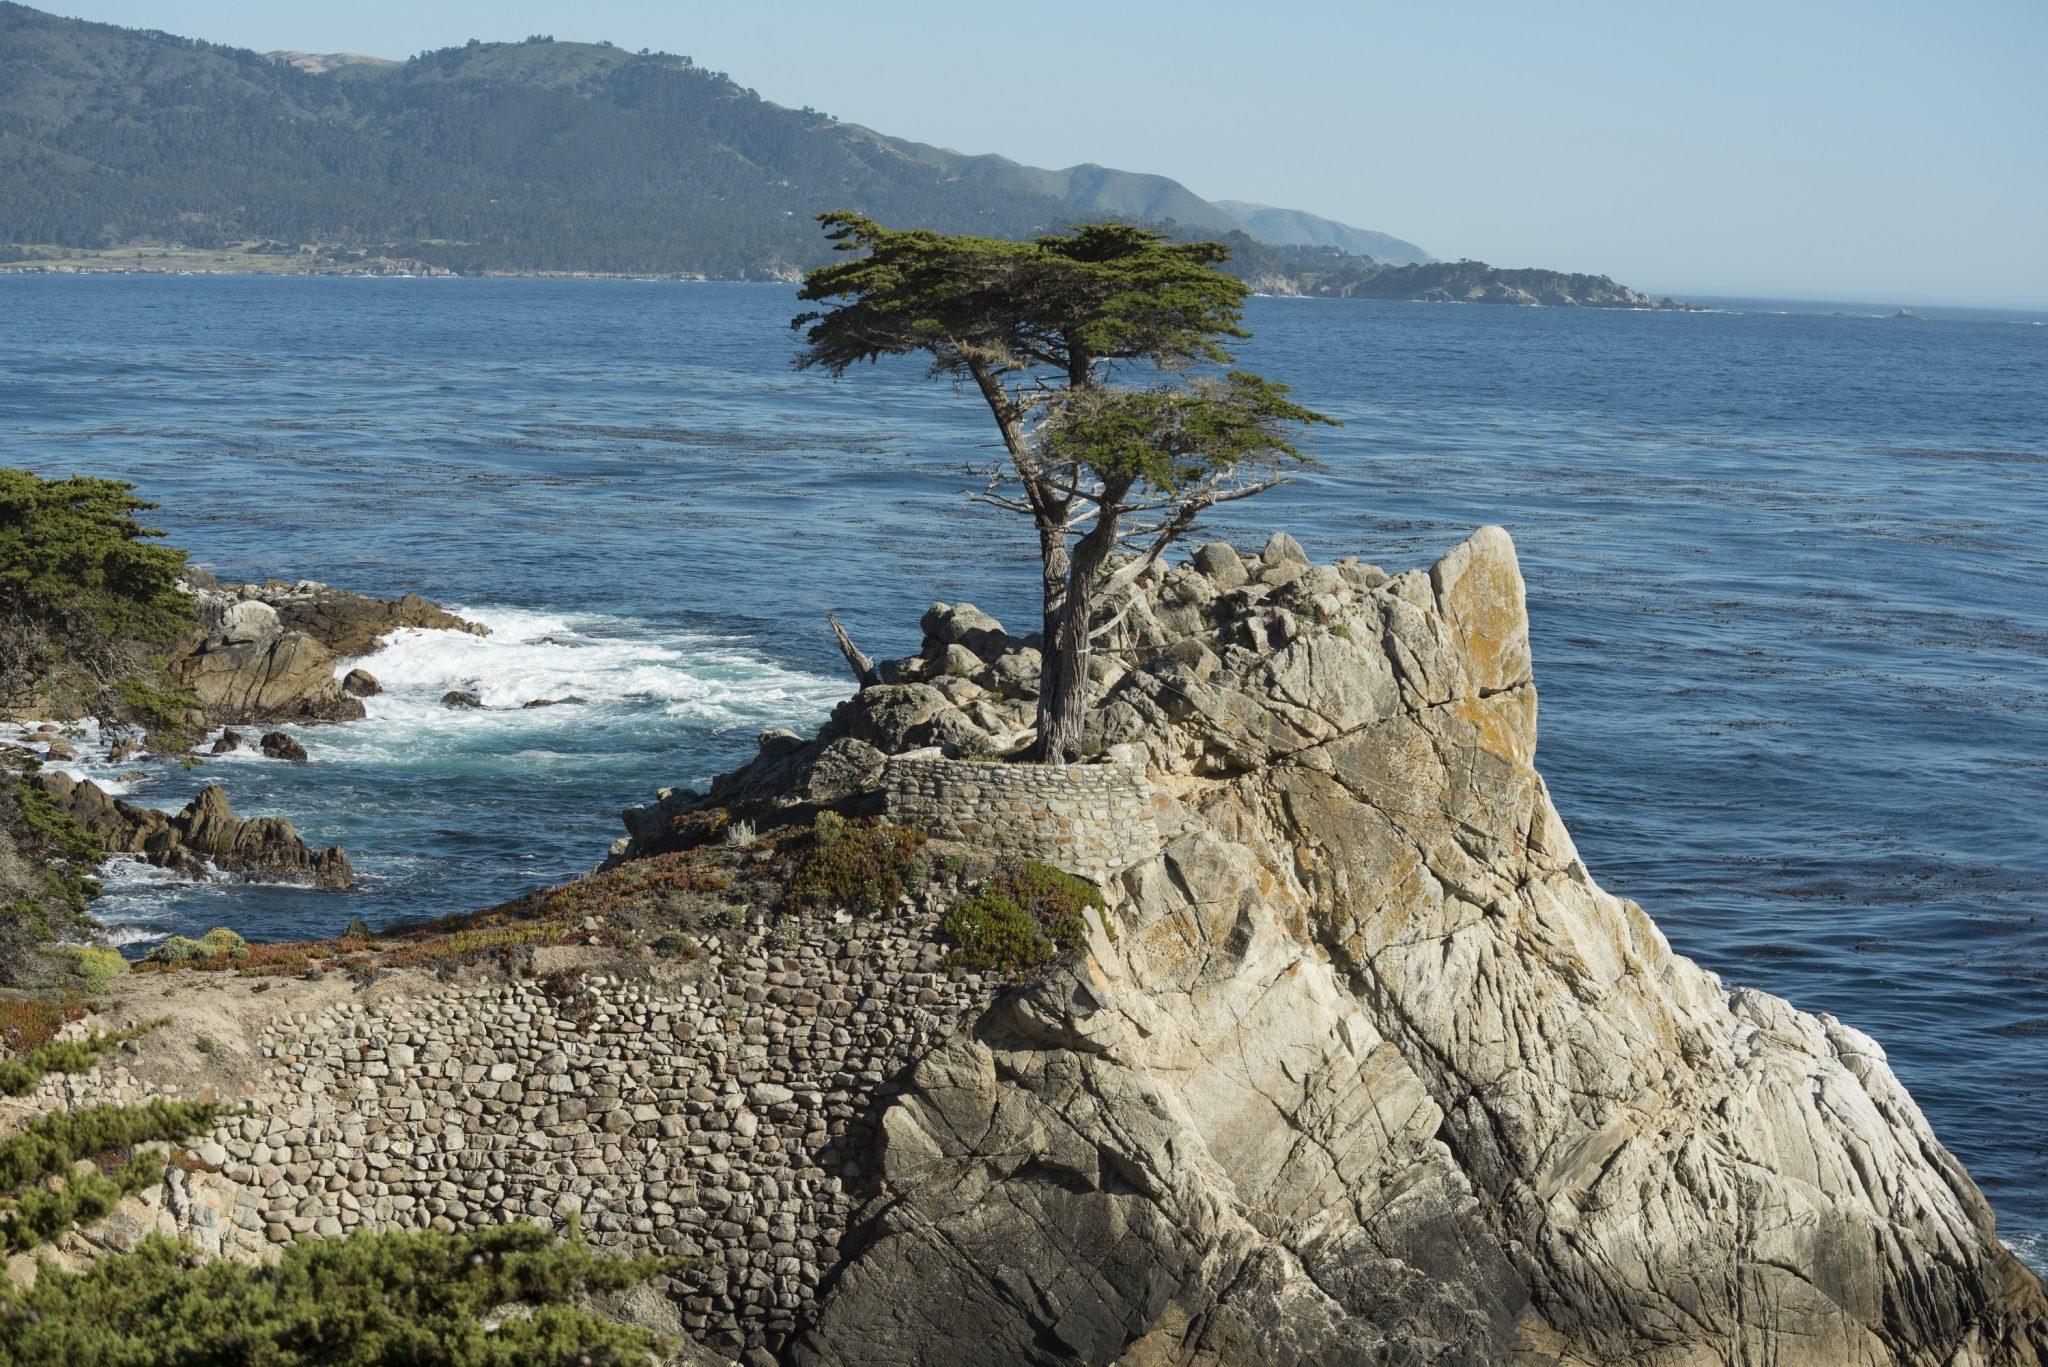 Monterey, California - Pebble Beach